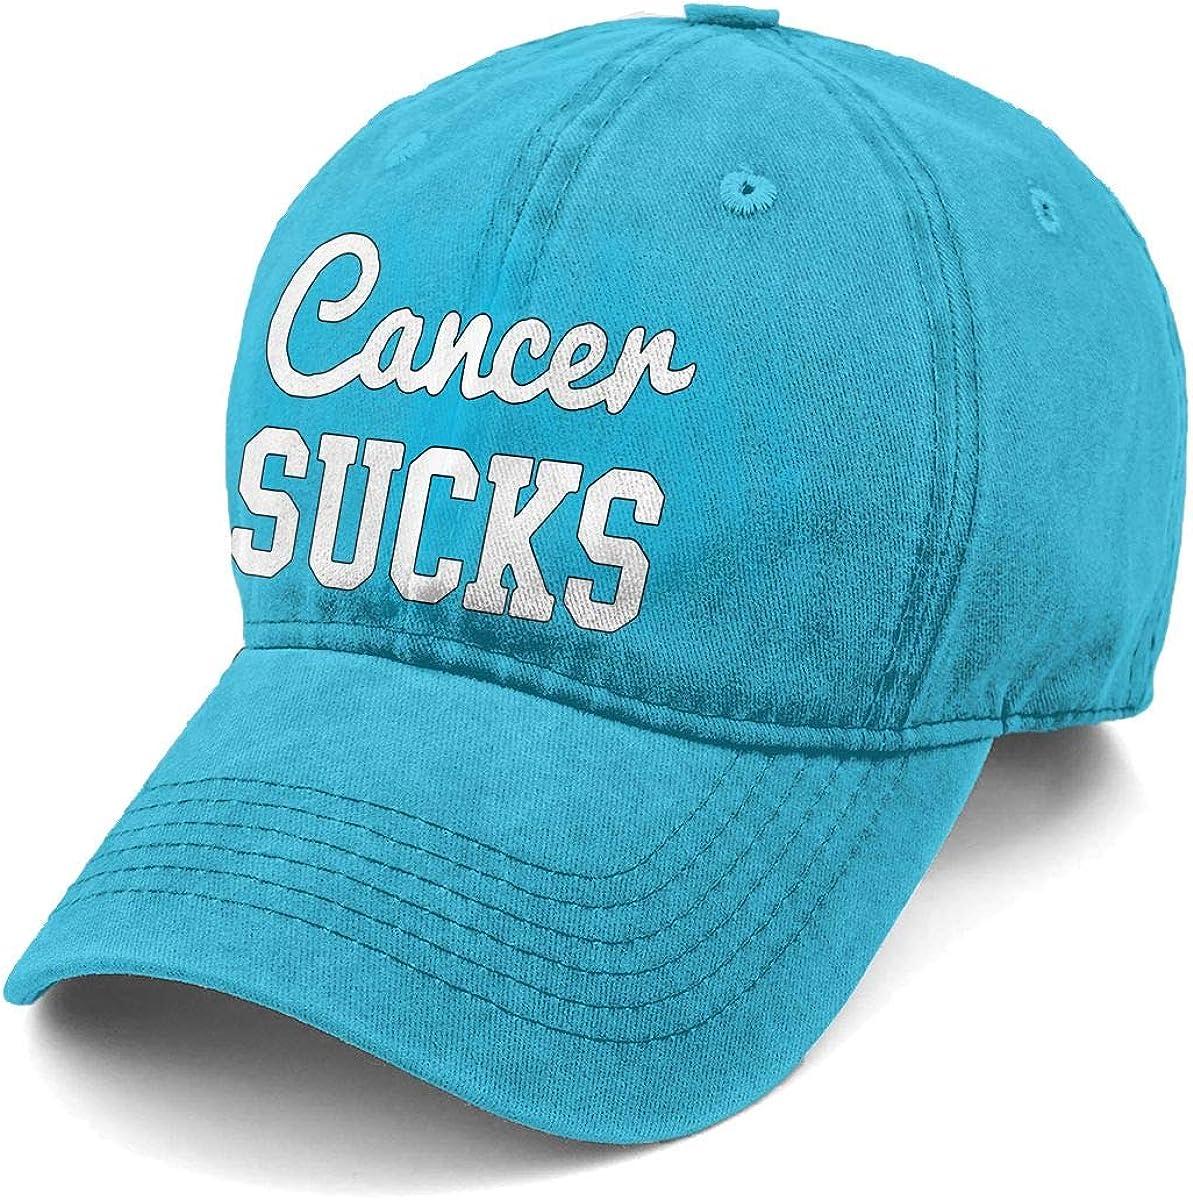 KELLYMOLL Cancer Sucks New Men and Women Adult Comfort Adjustable Denim Hat Truck Baseball Cap